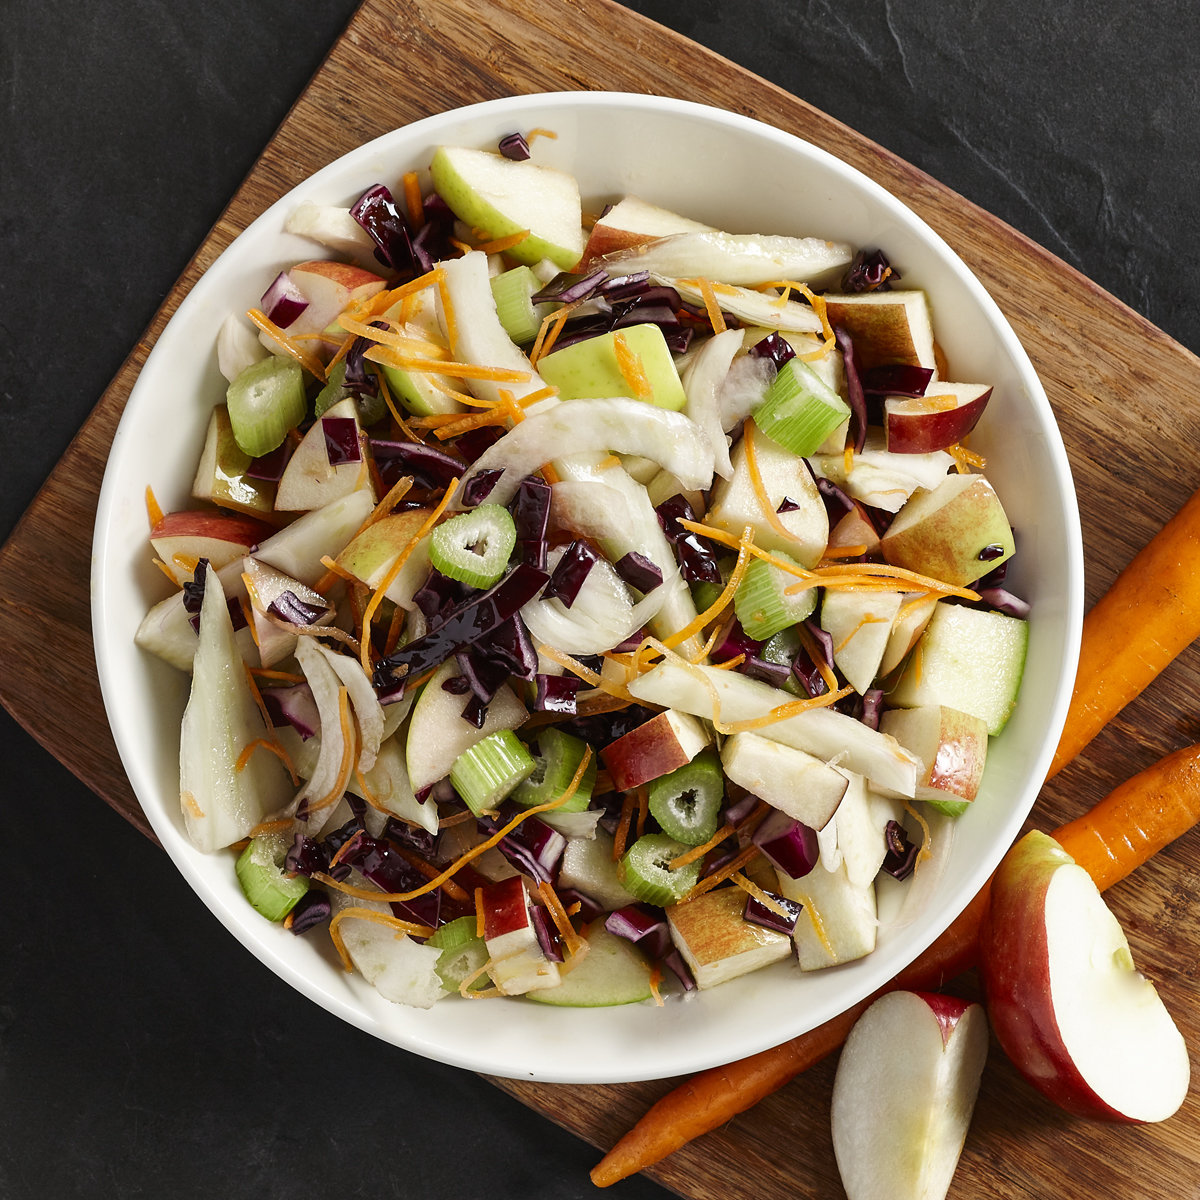 Salade croustillante fenouil & pommes